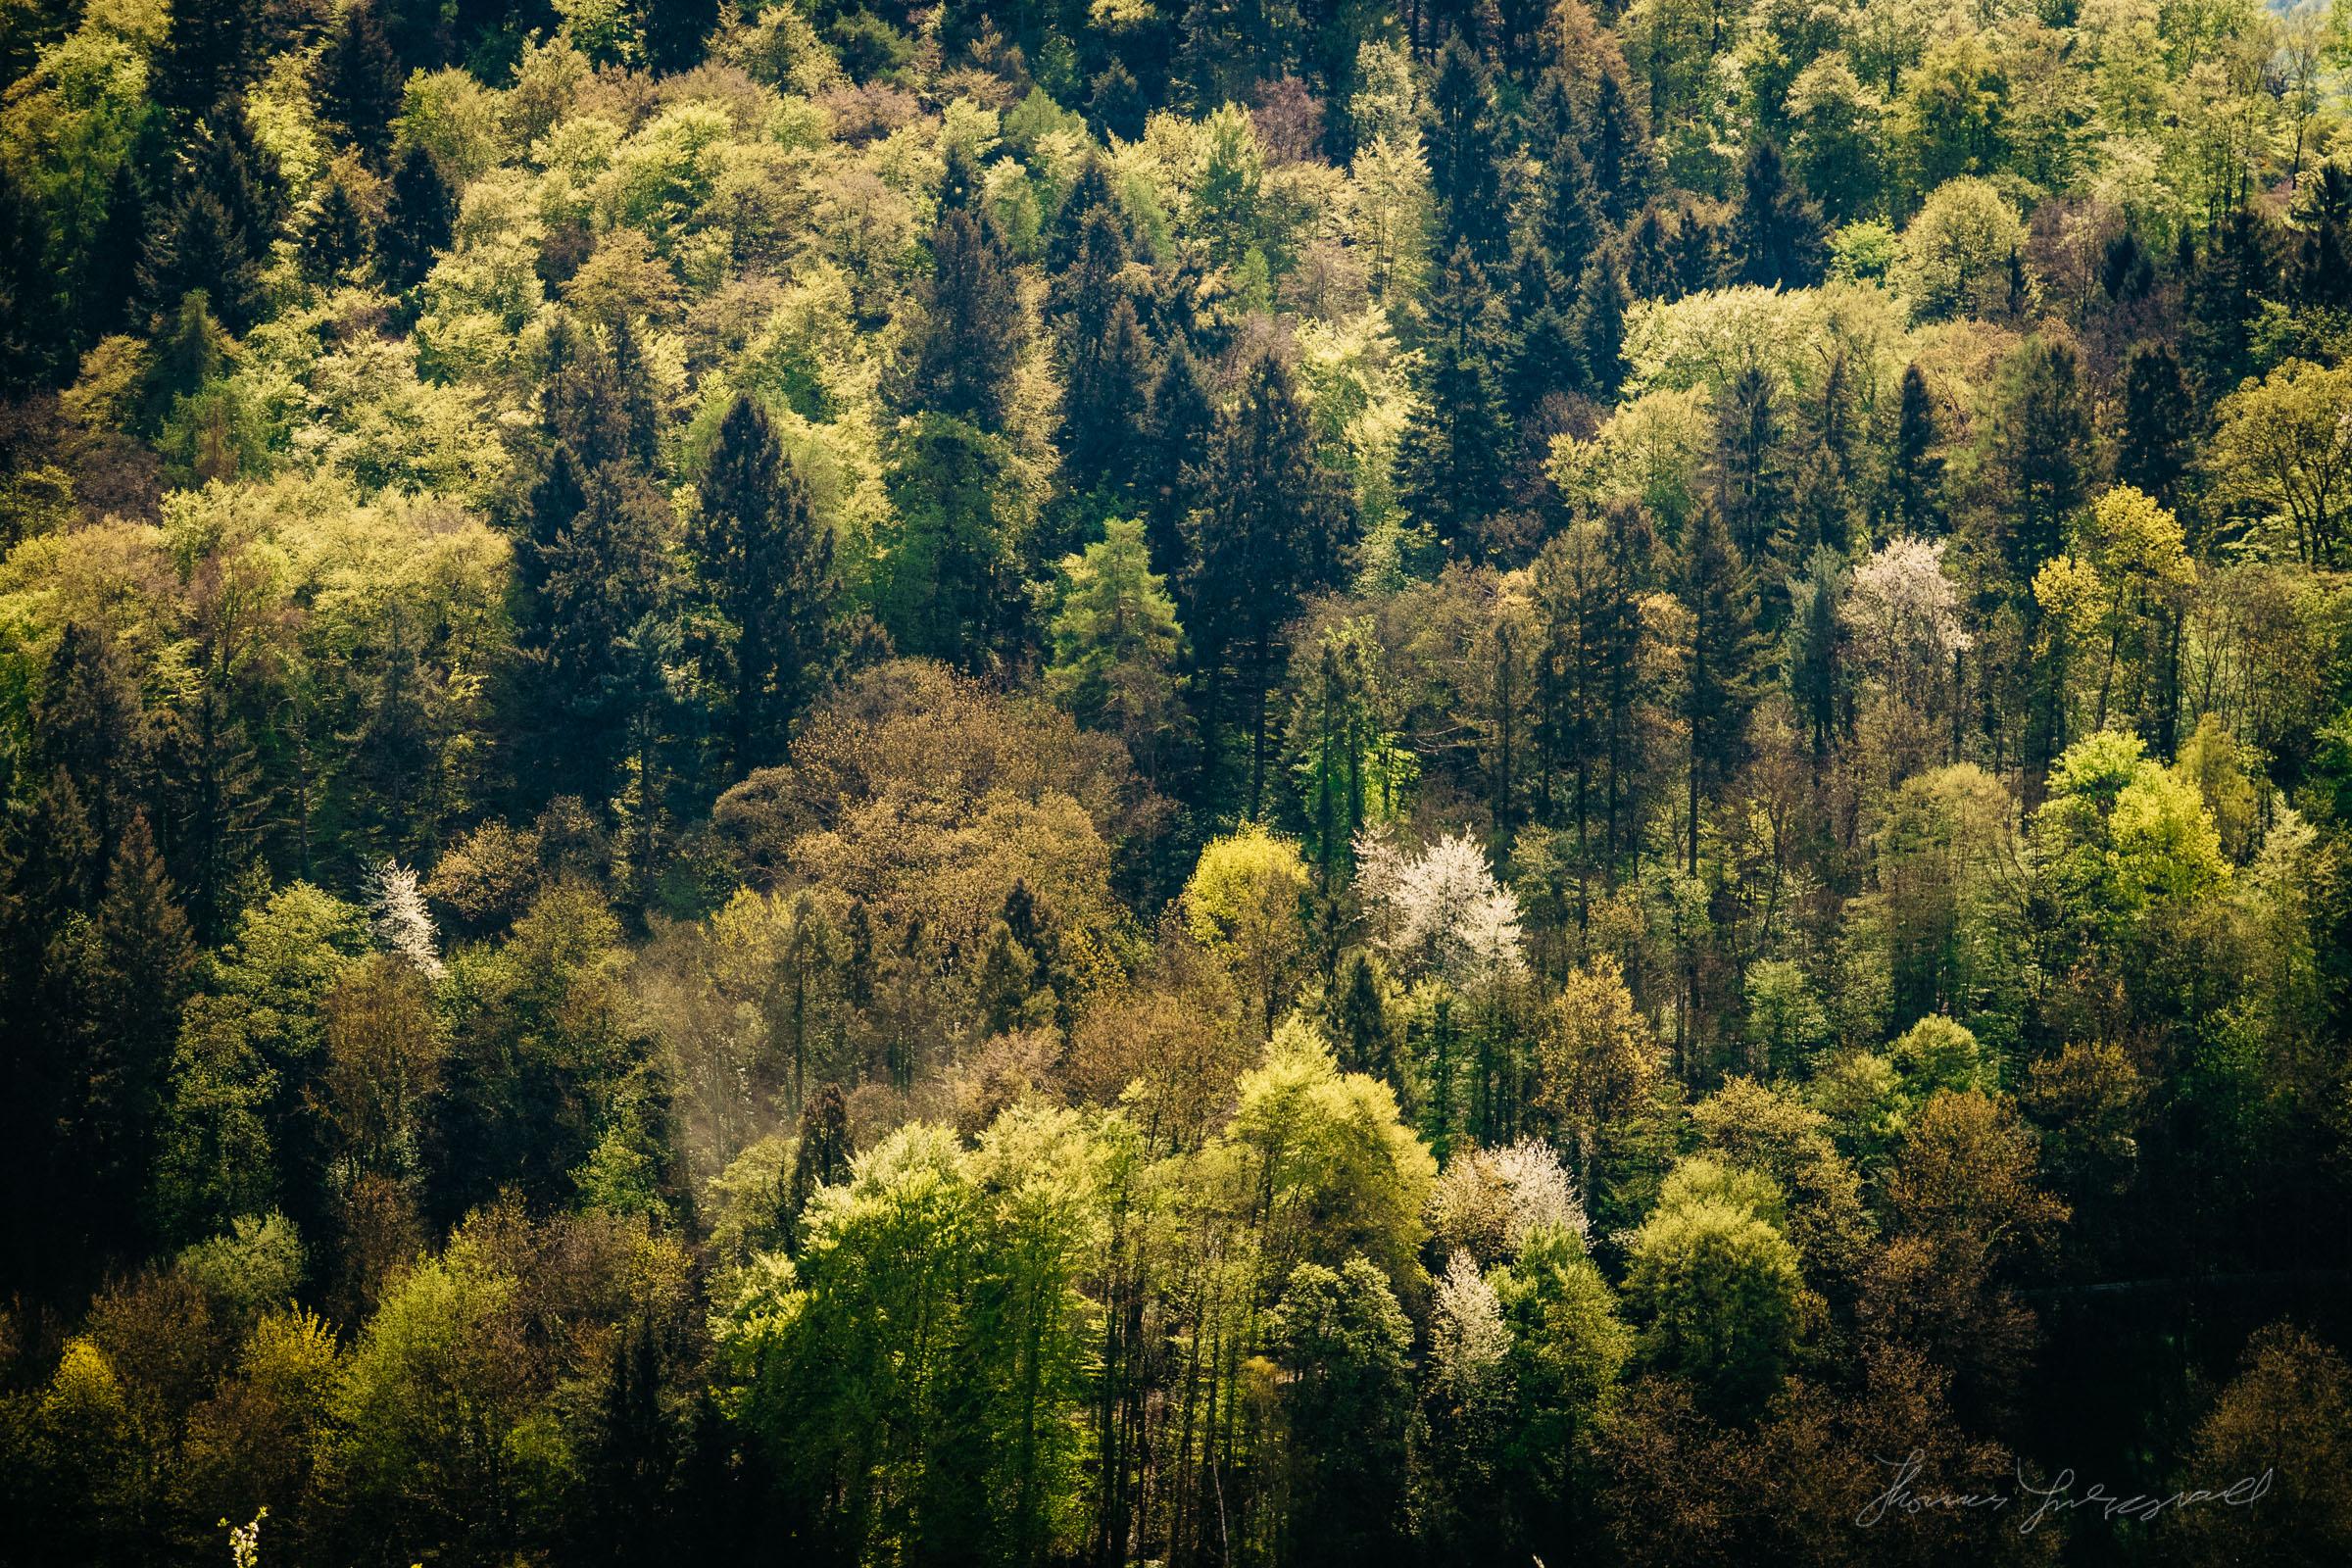 Heppenheim Forest